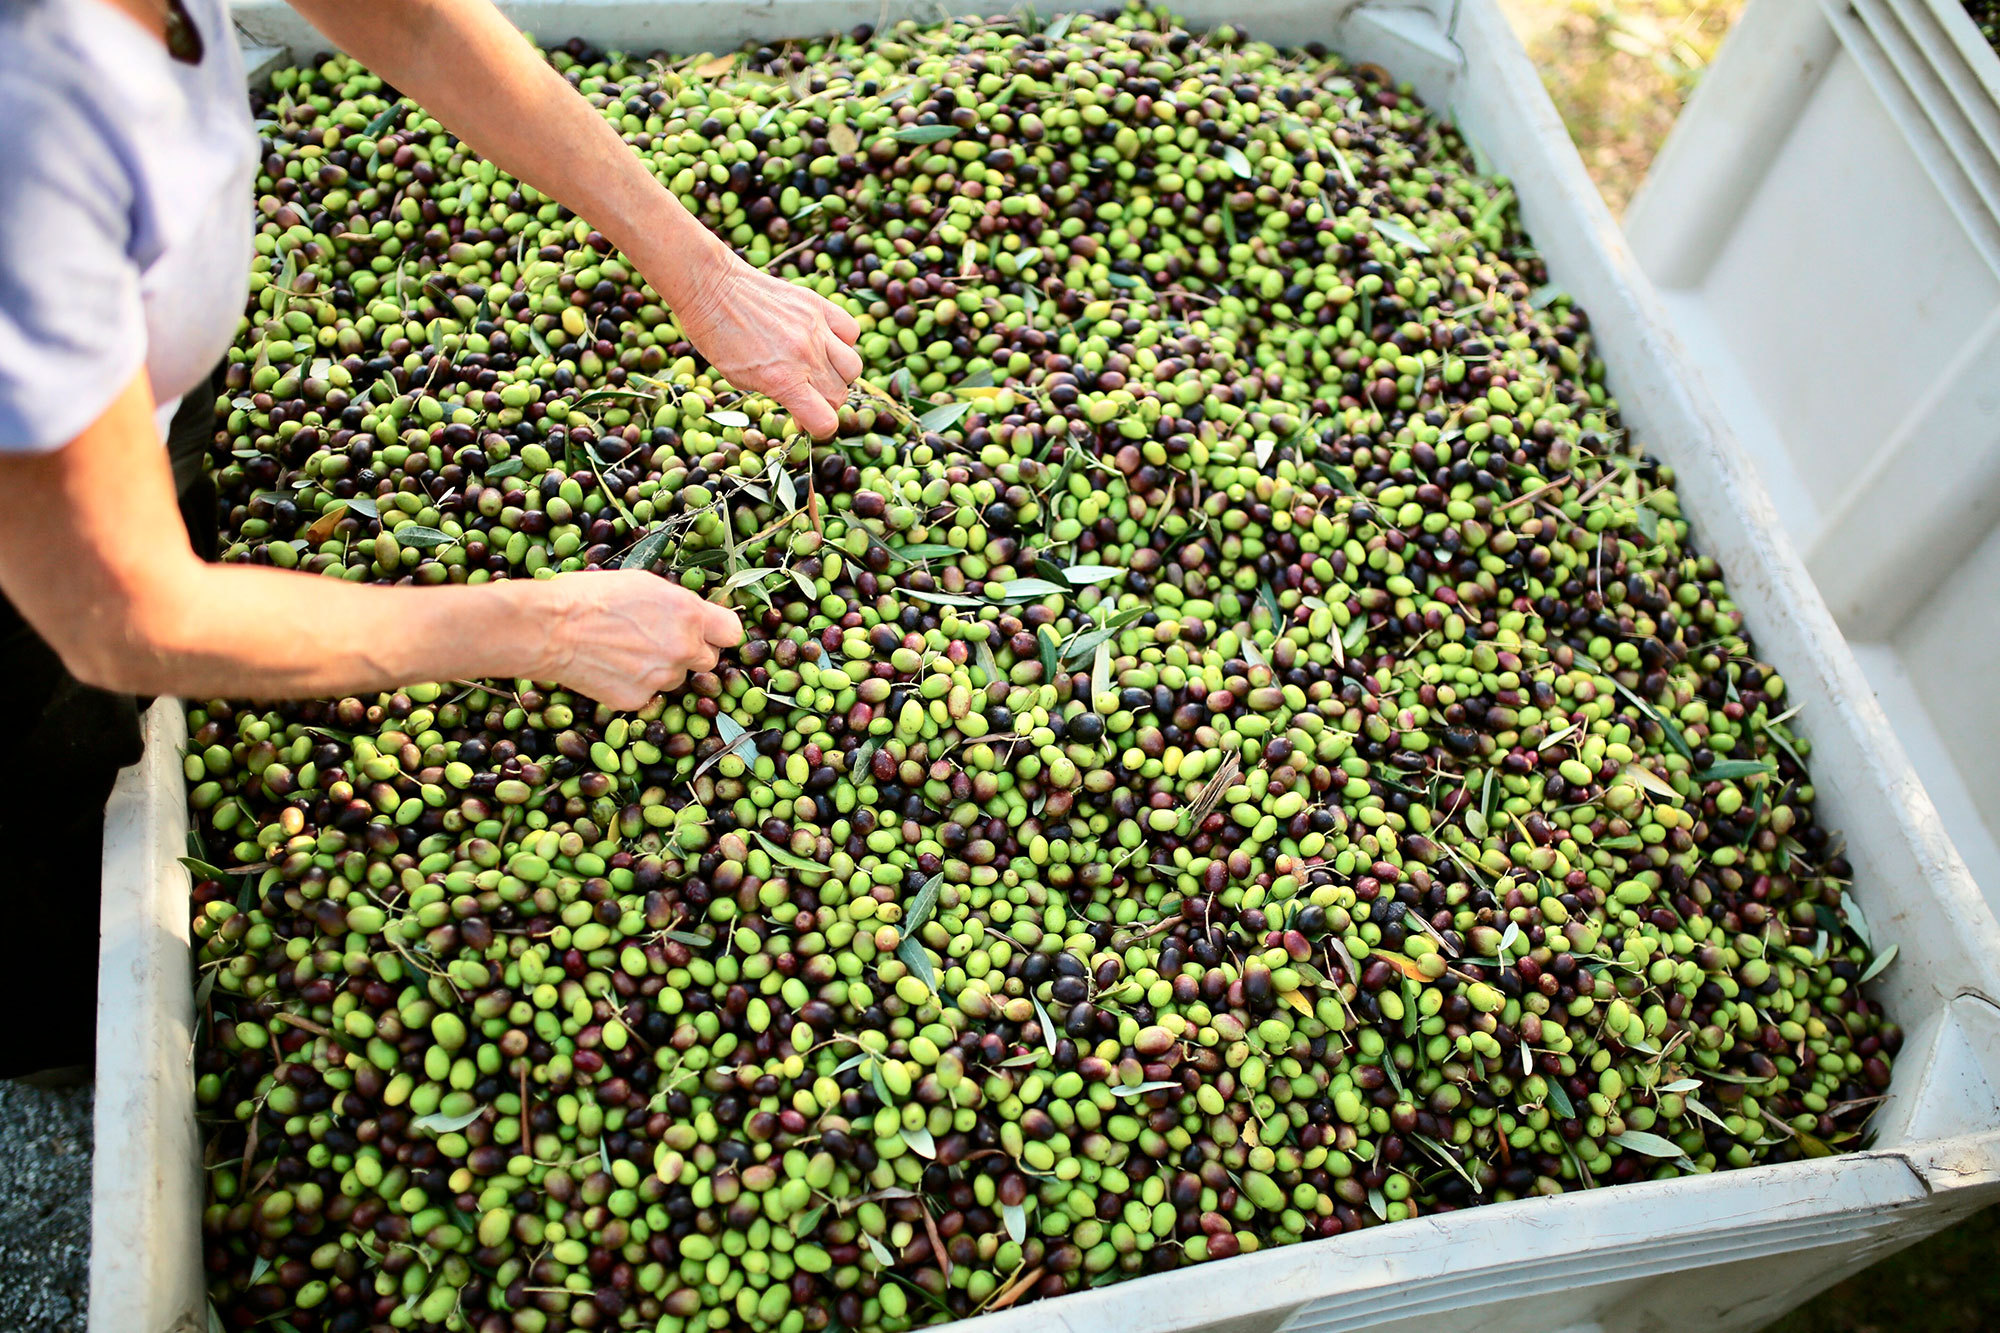 bin-of-olives-horizontal.jpg